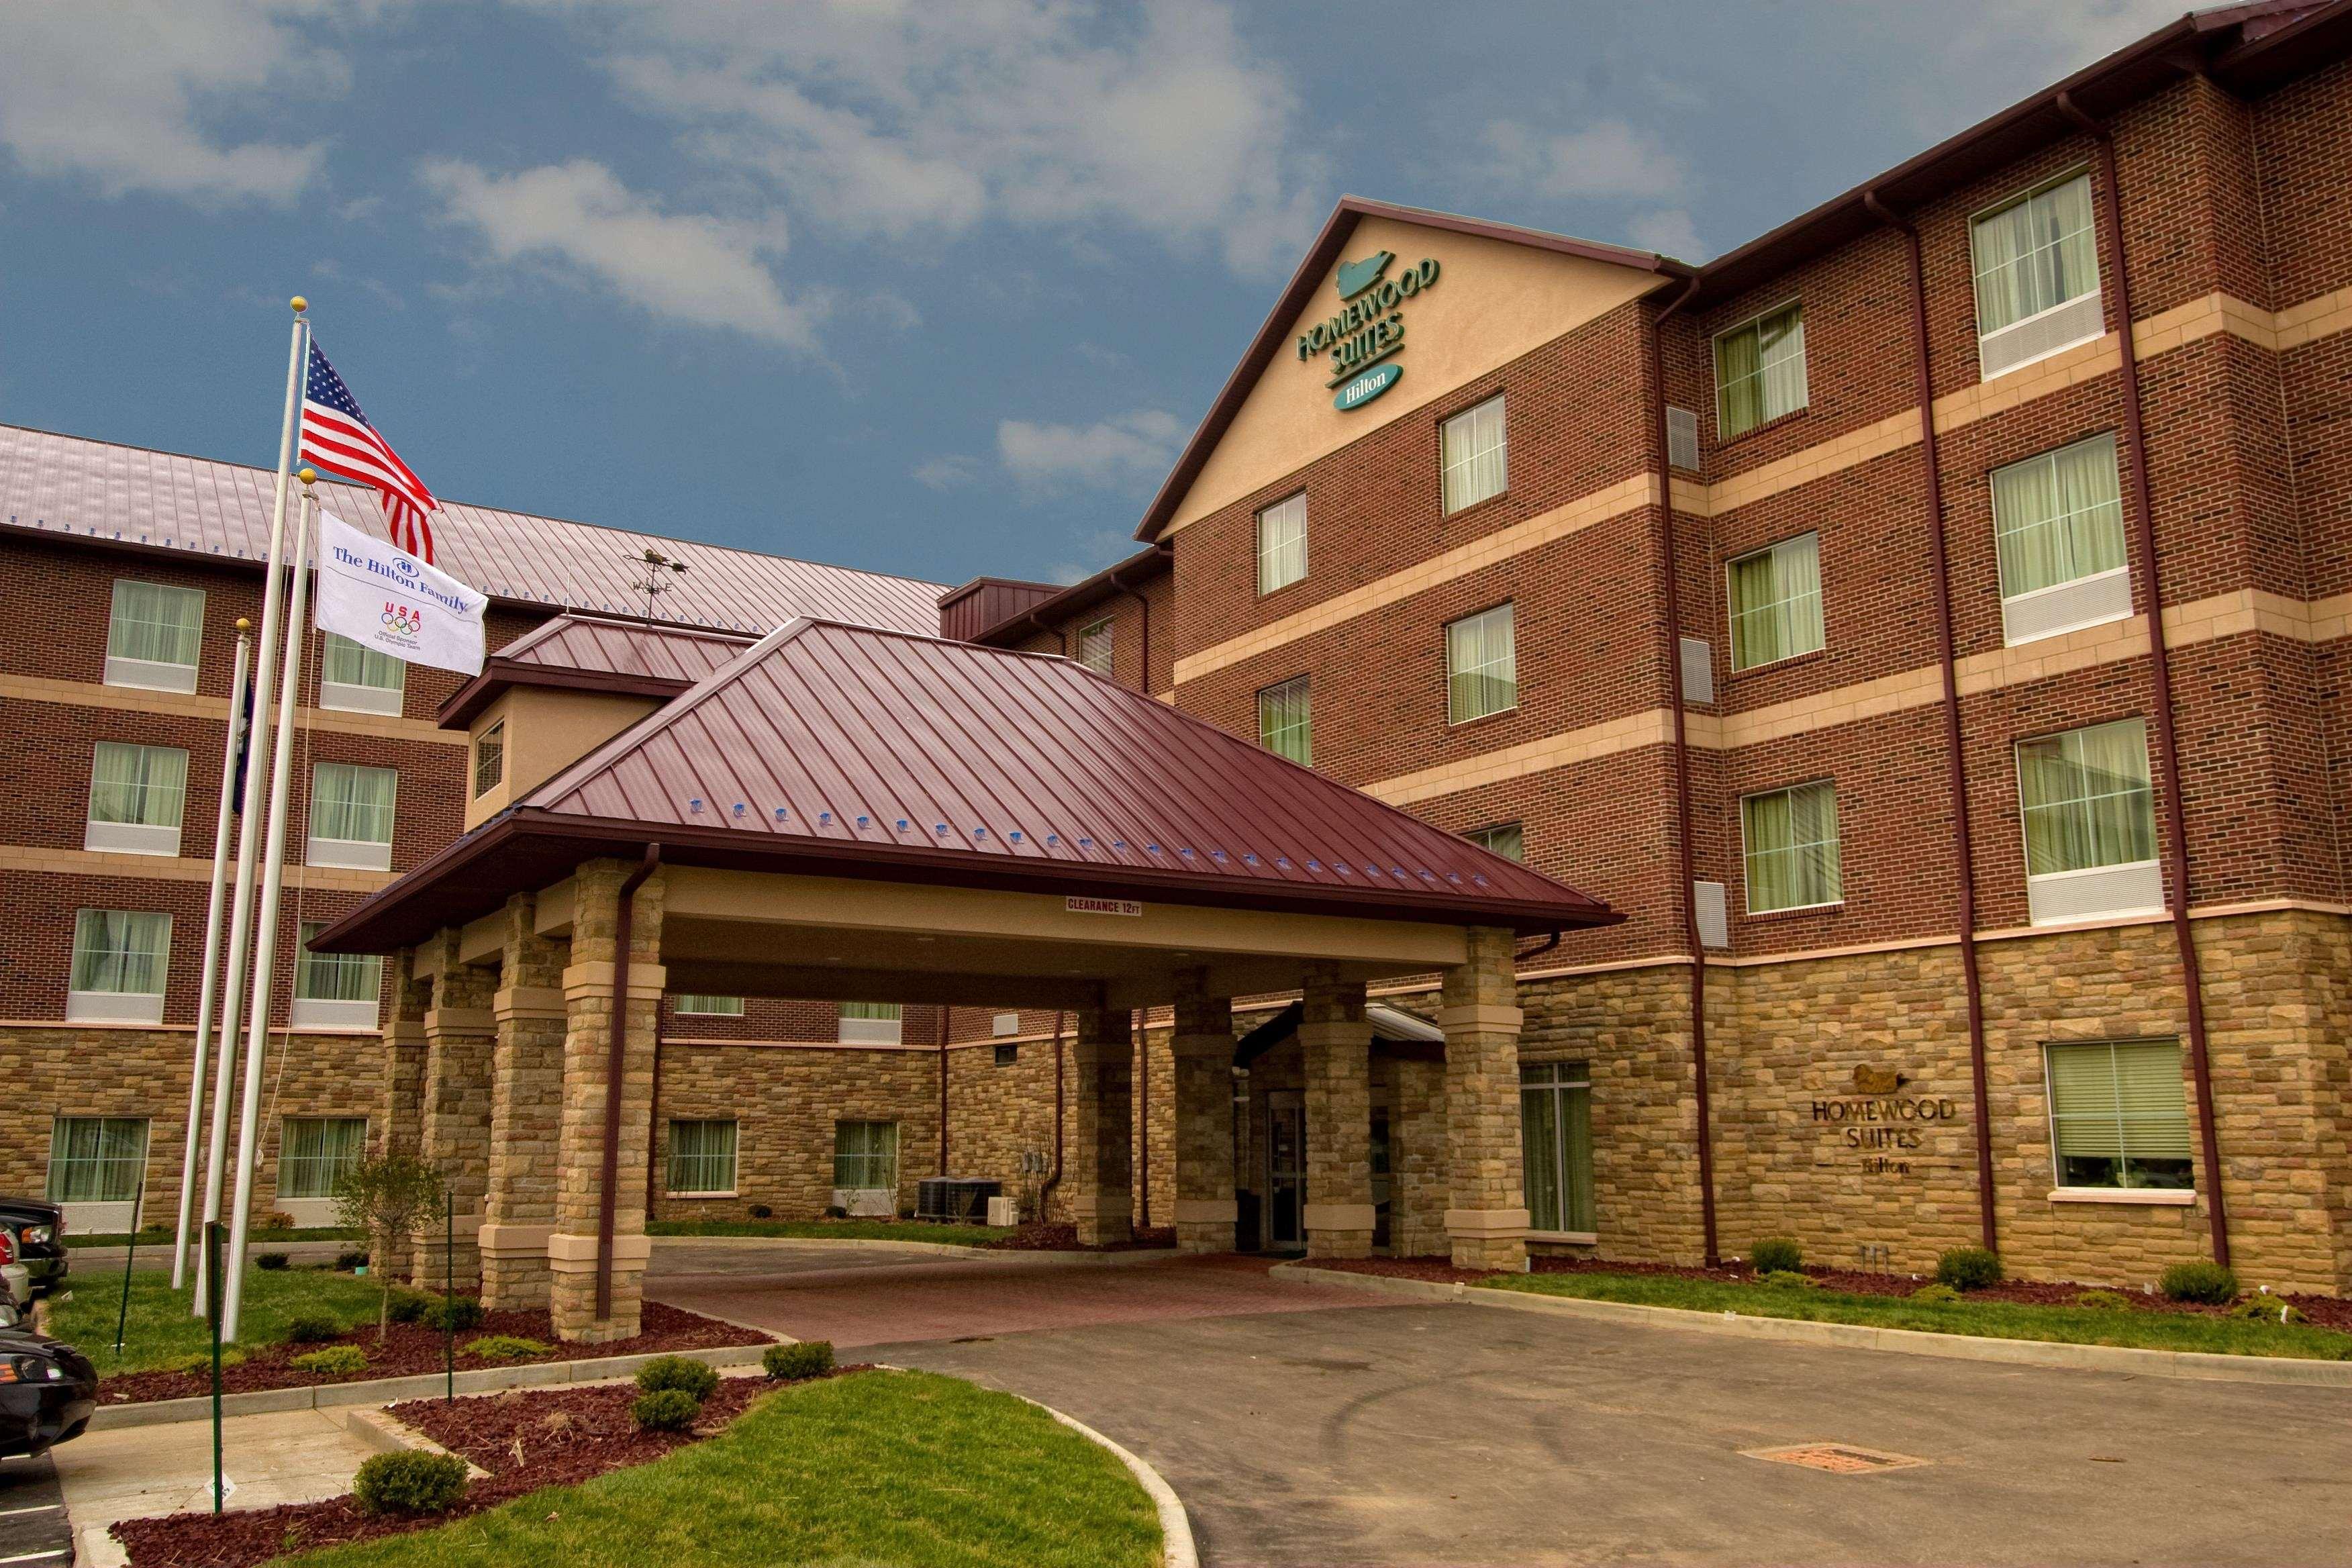 Homewood Suites by Hilton Cincinnati Airport South-Florence image 1